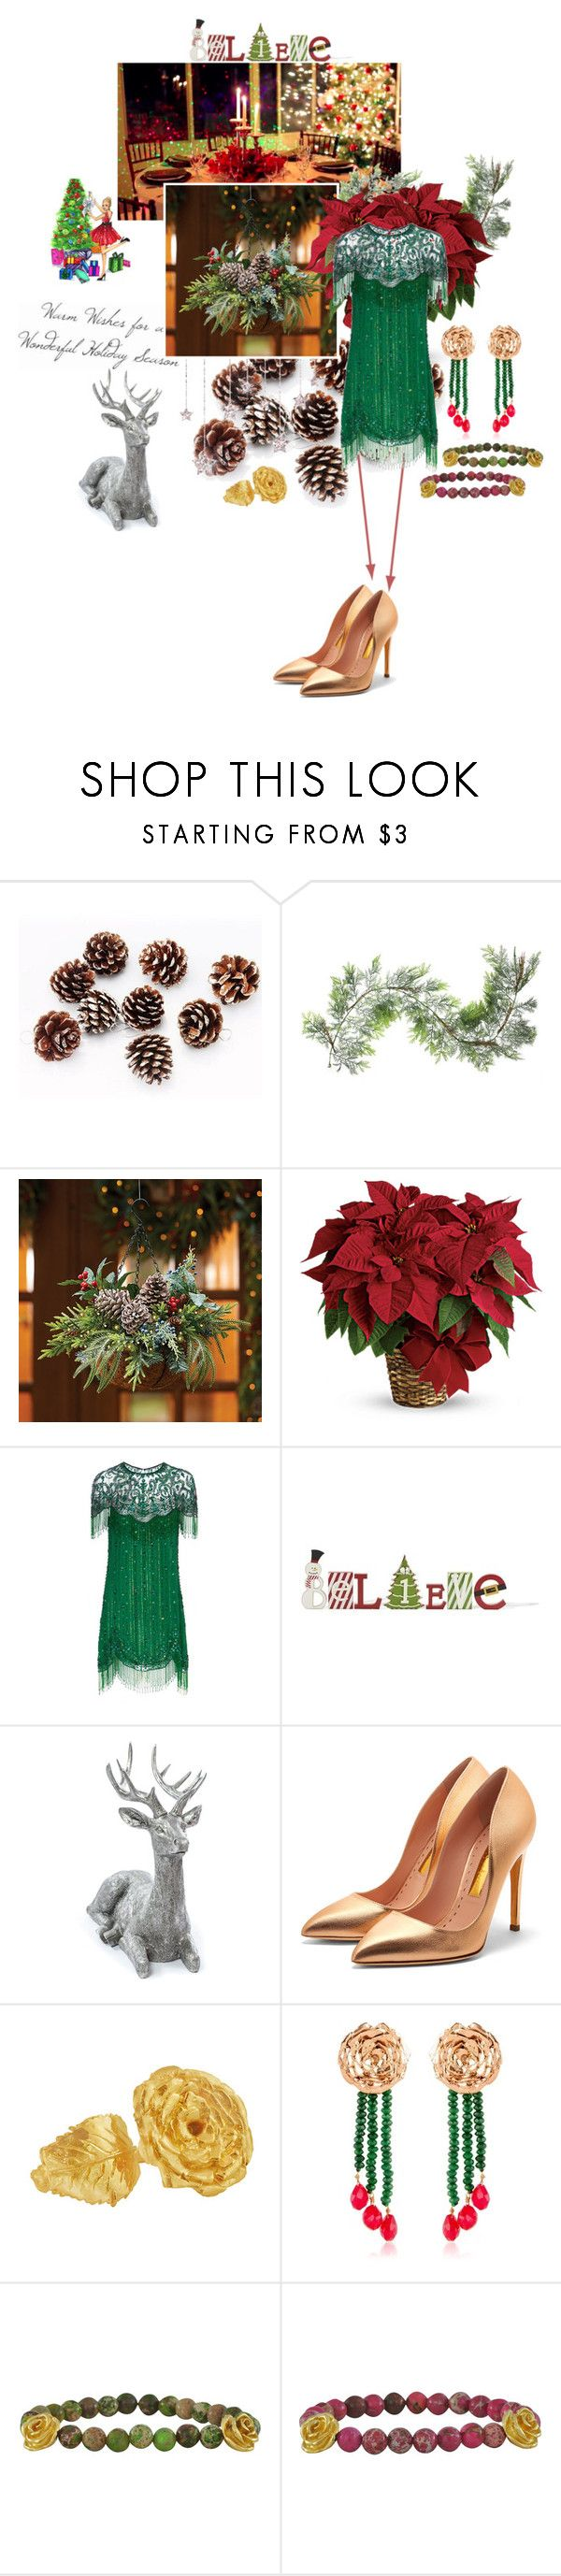 """2321.Holiday Seasons"" by sylviedupuywriter ❤ liked on Polyvore featuring Northlight Homestore, Improvements, Jenny Packham, Rupert Sanderson and LeiVanKash"